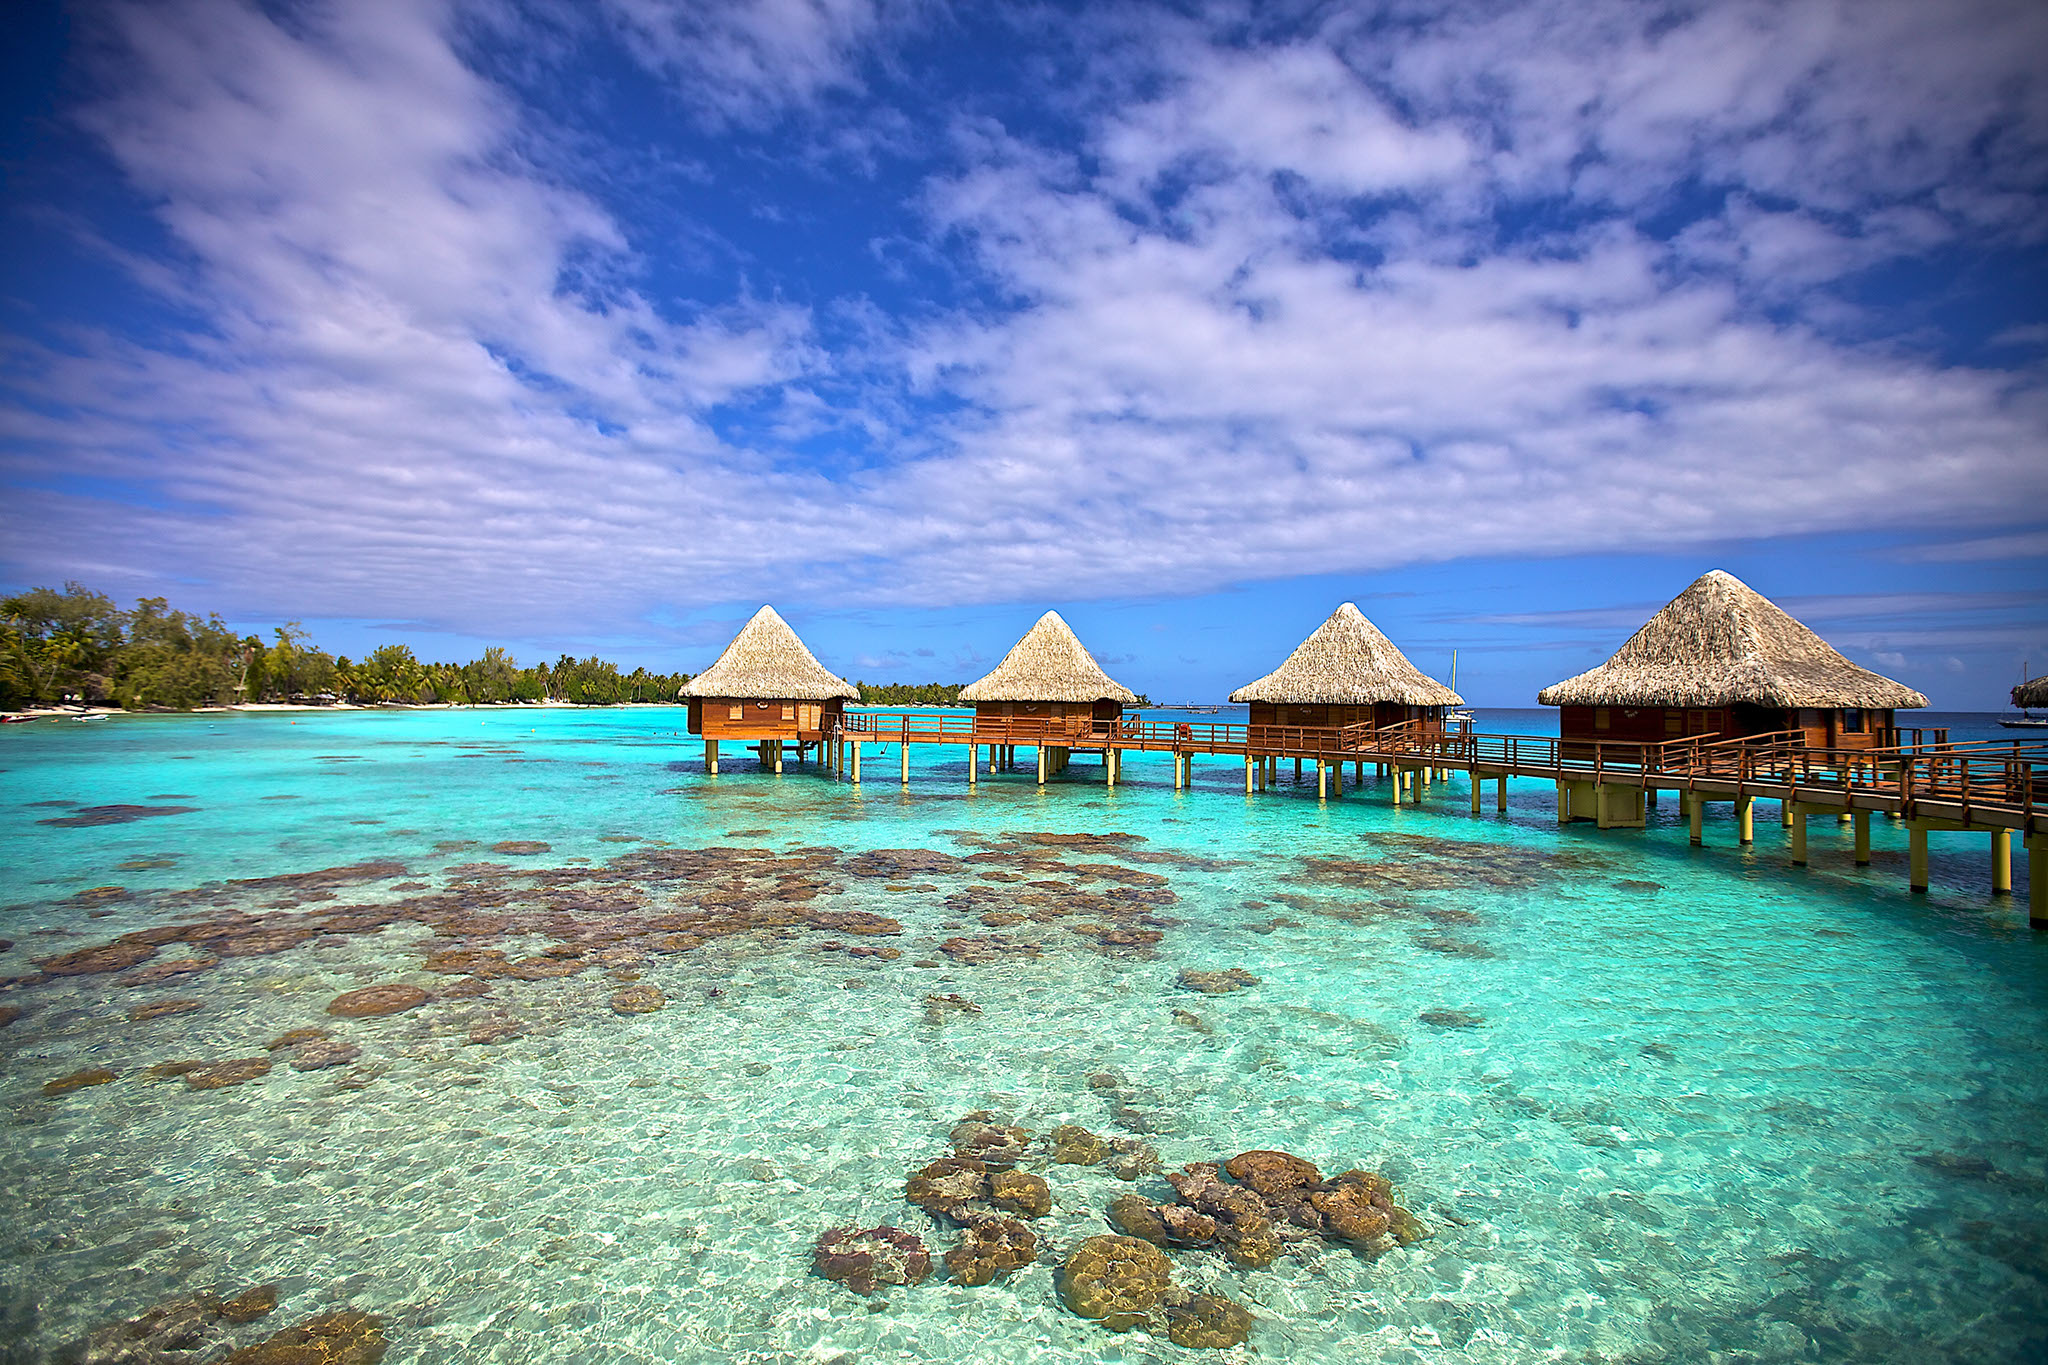 https://tahititourisme.nz/wp-content/uploads/2017/08/RGI-Kia-Ora-Overwater-Bungalows-Exterior-20.gallery_image.1.jpg